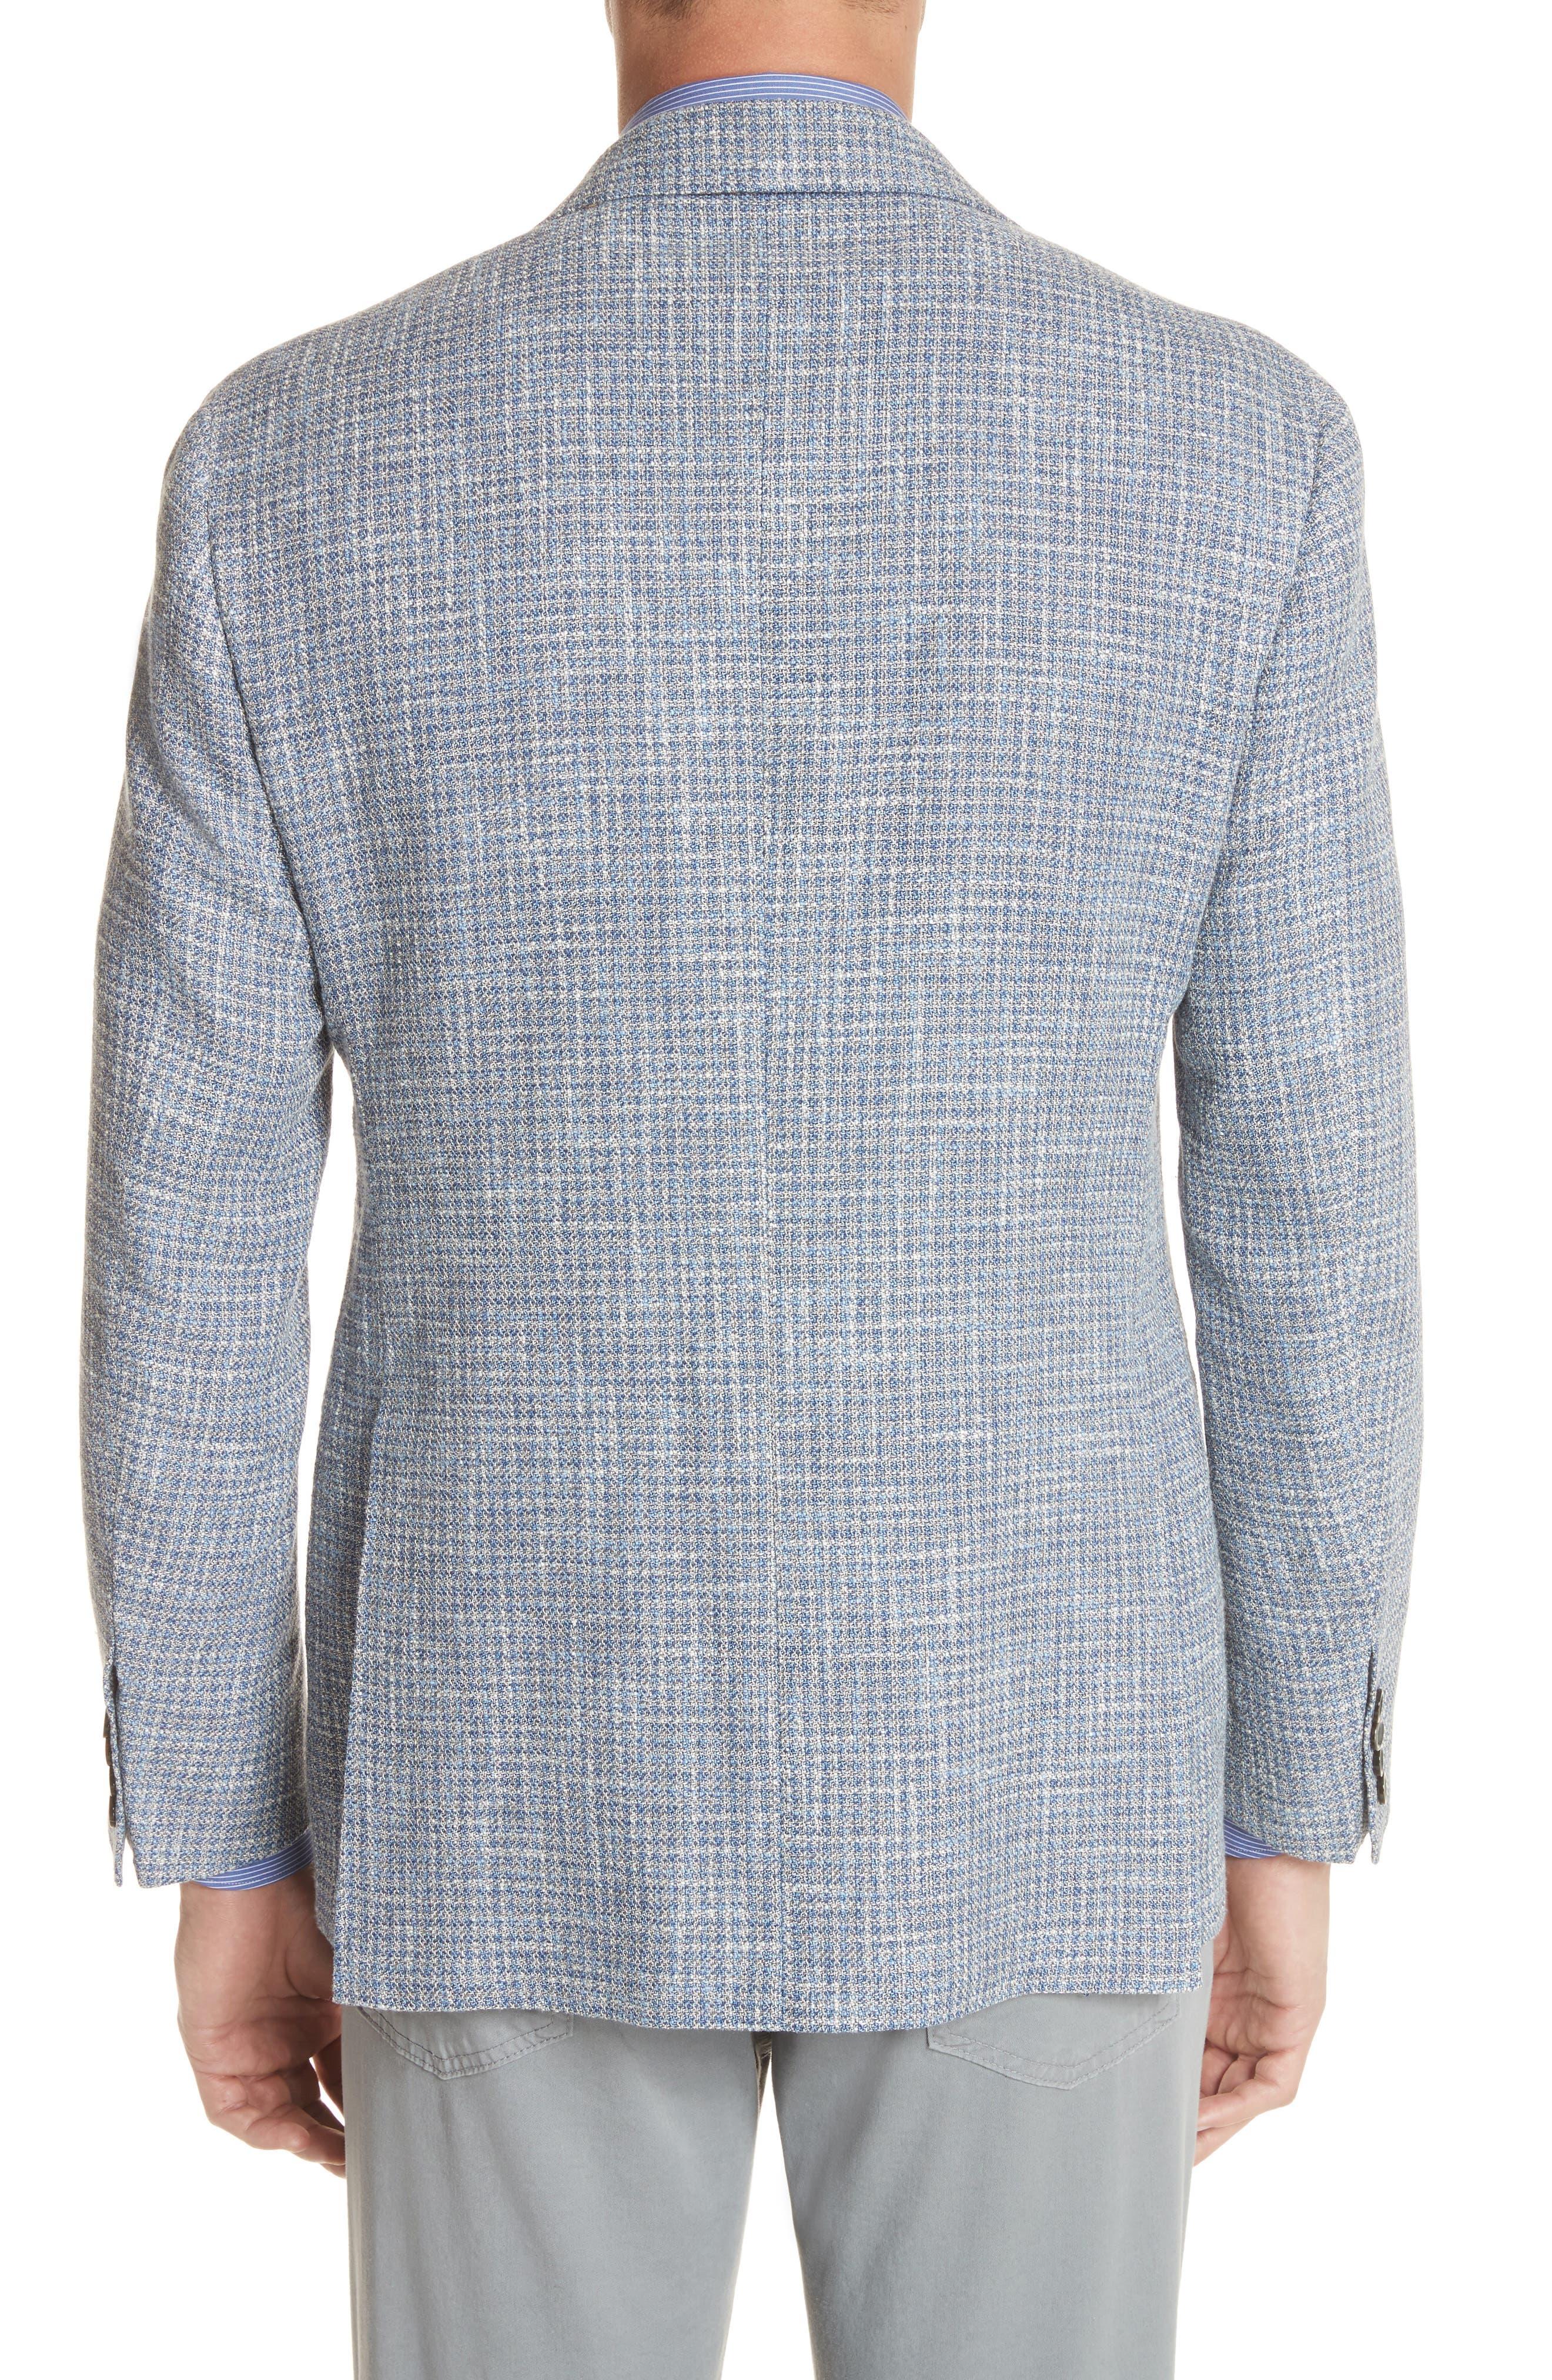 CANALI,                             Kei Classic Fit Check Sport Coat,                             Alternate thumbnail 2, color,                             400